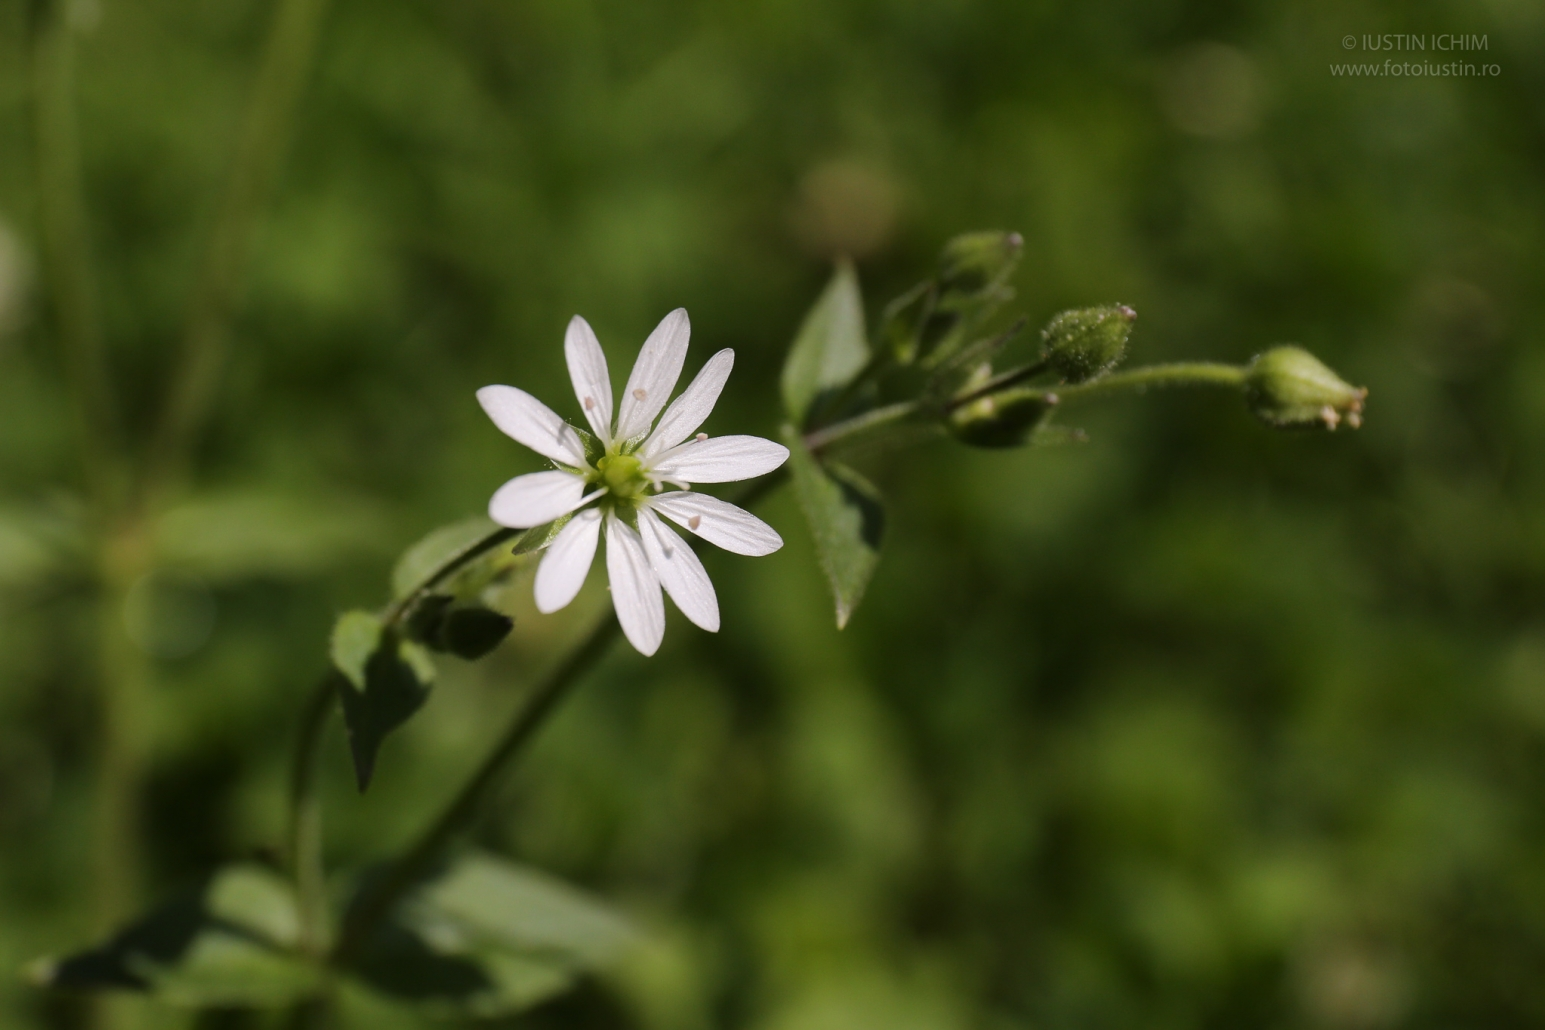 Stellaria graminea, Rocoțea